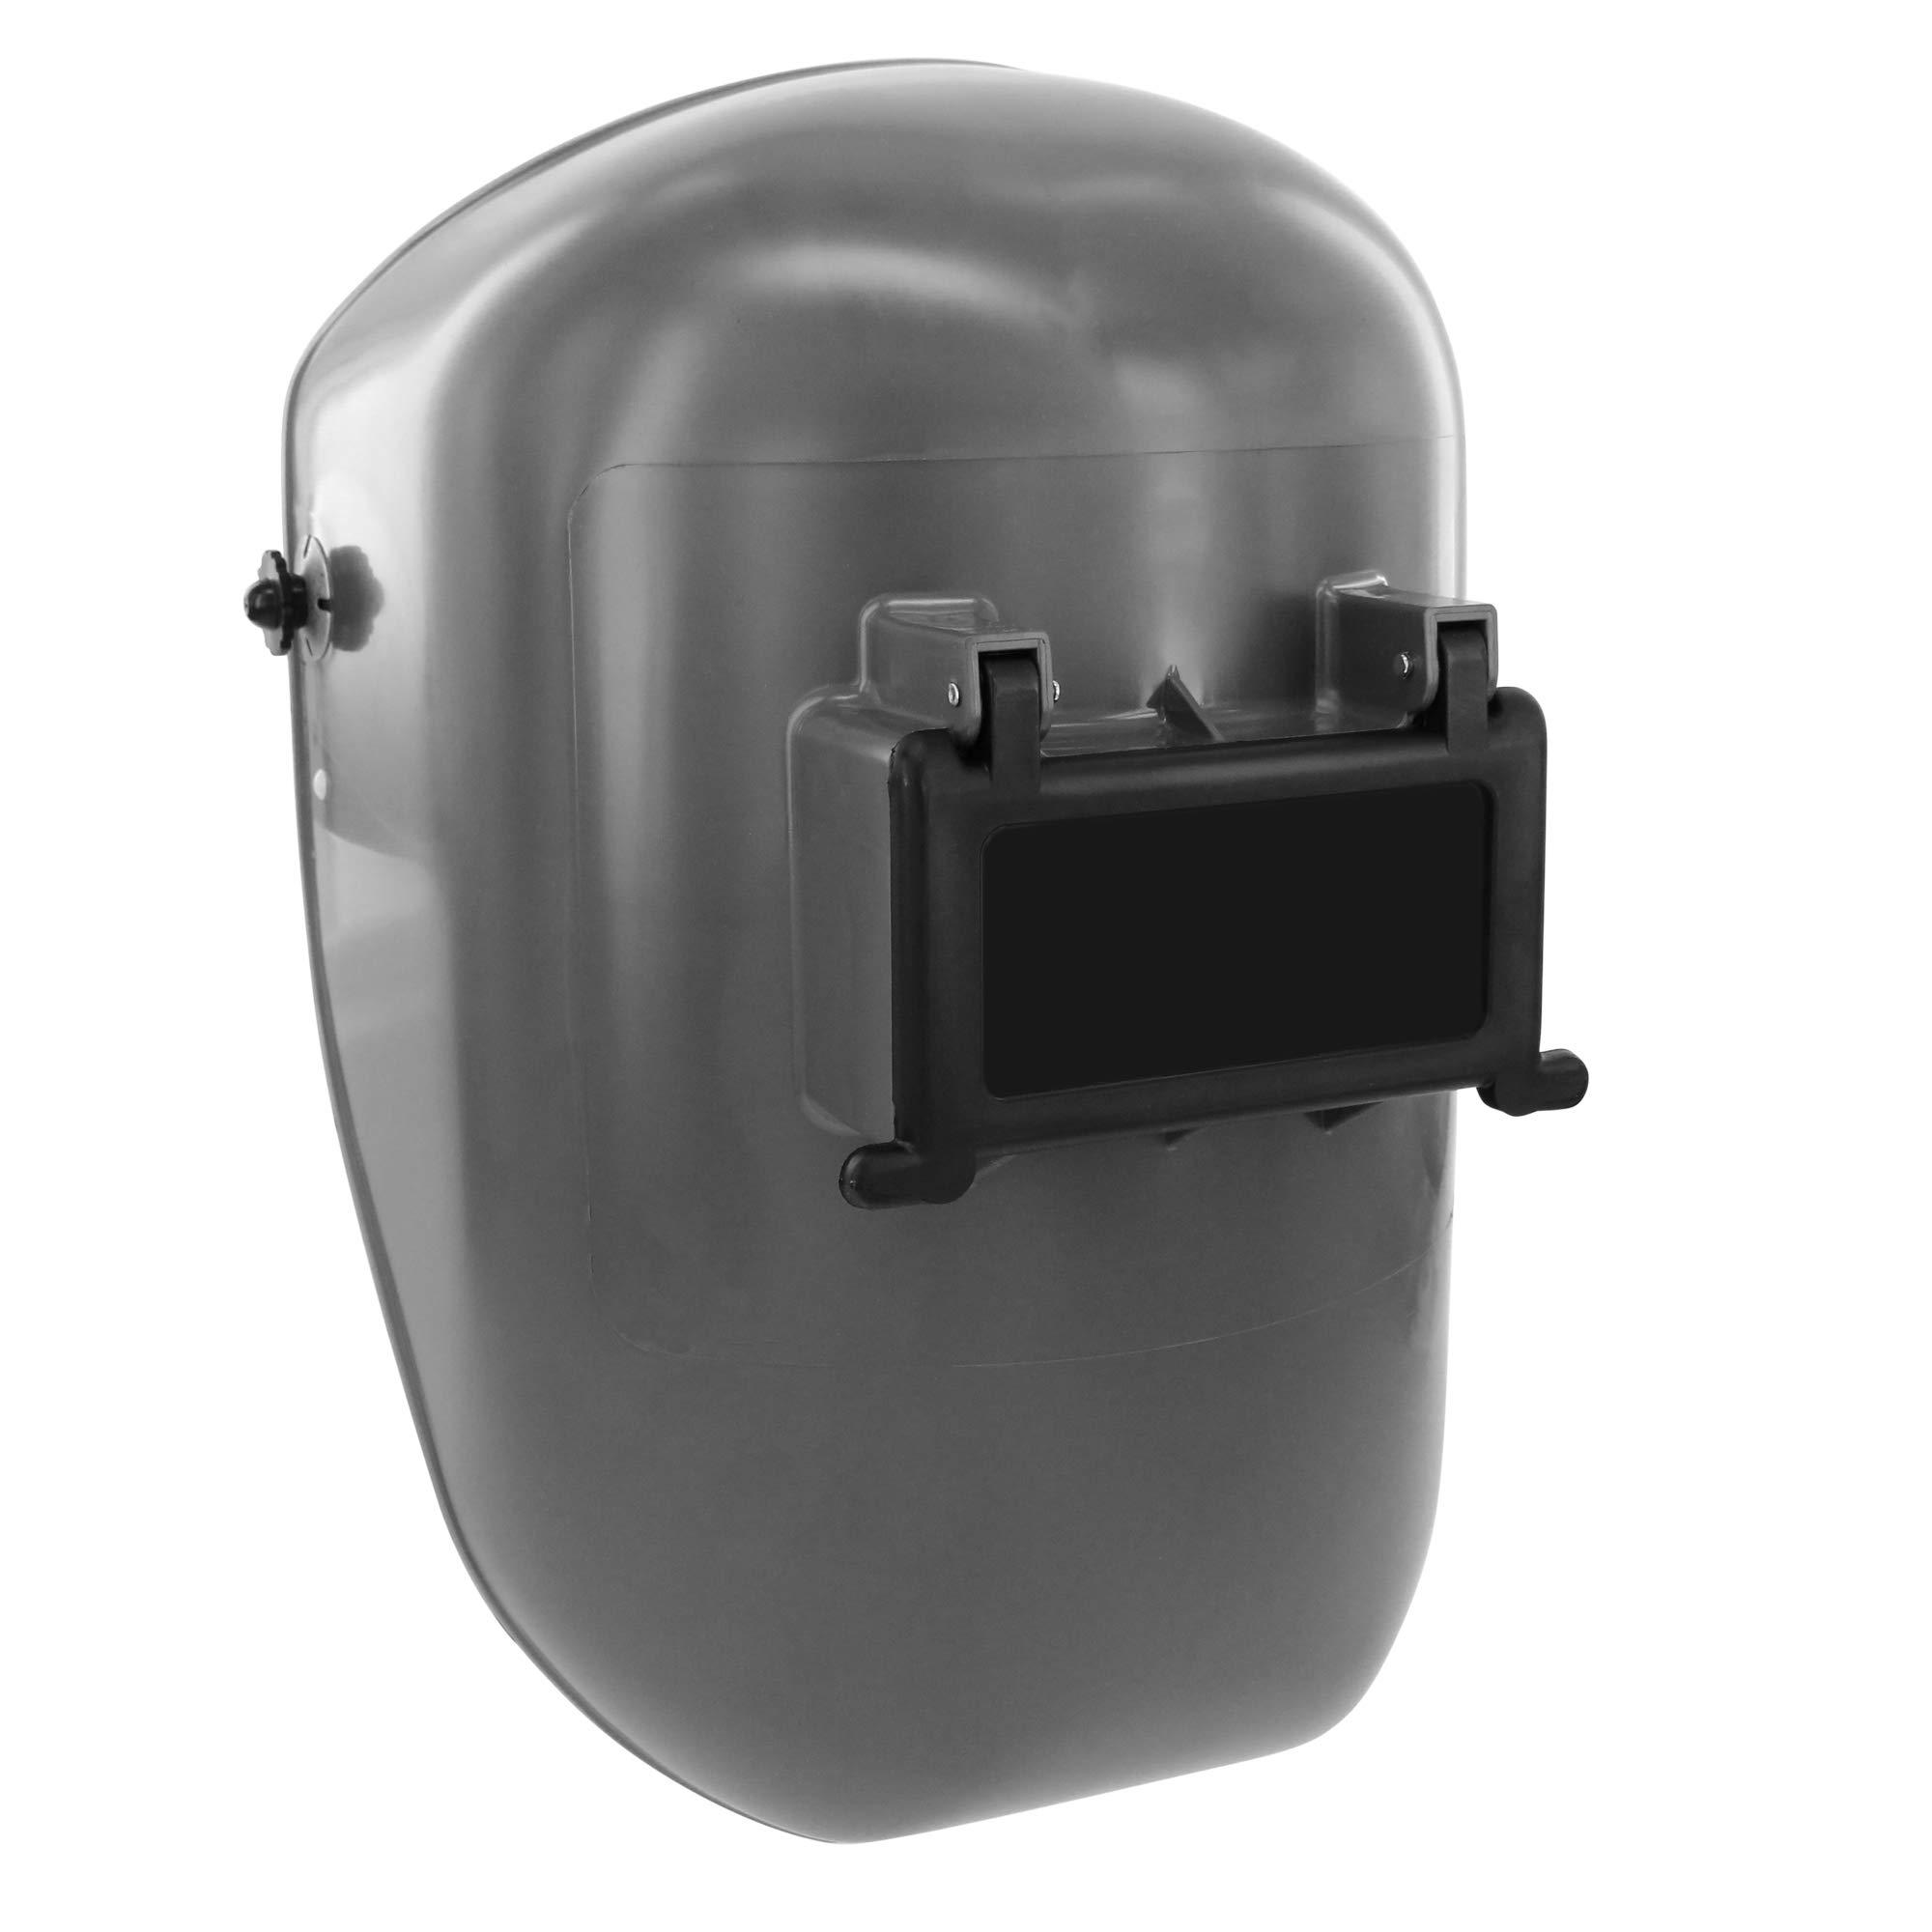 Fibre-Metal by Honeywell Tigerhood Classic Thermoplastic Welding Helmet with Speedy Loop Hard Hat Mount, Gray (5906GY)